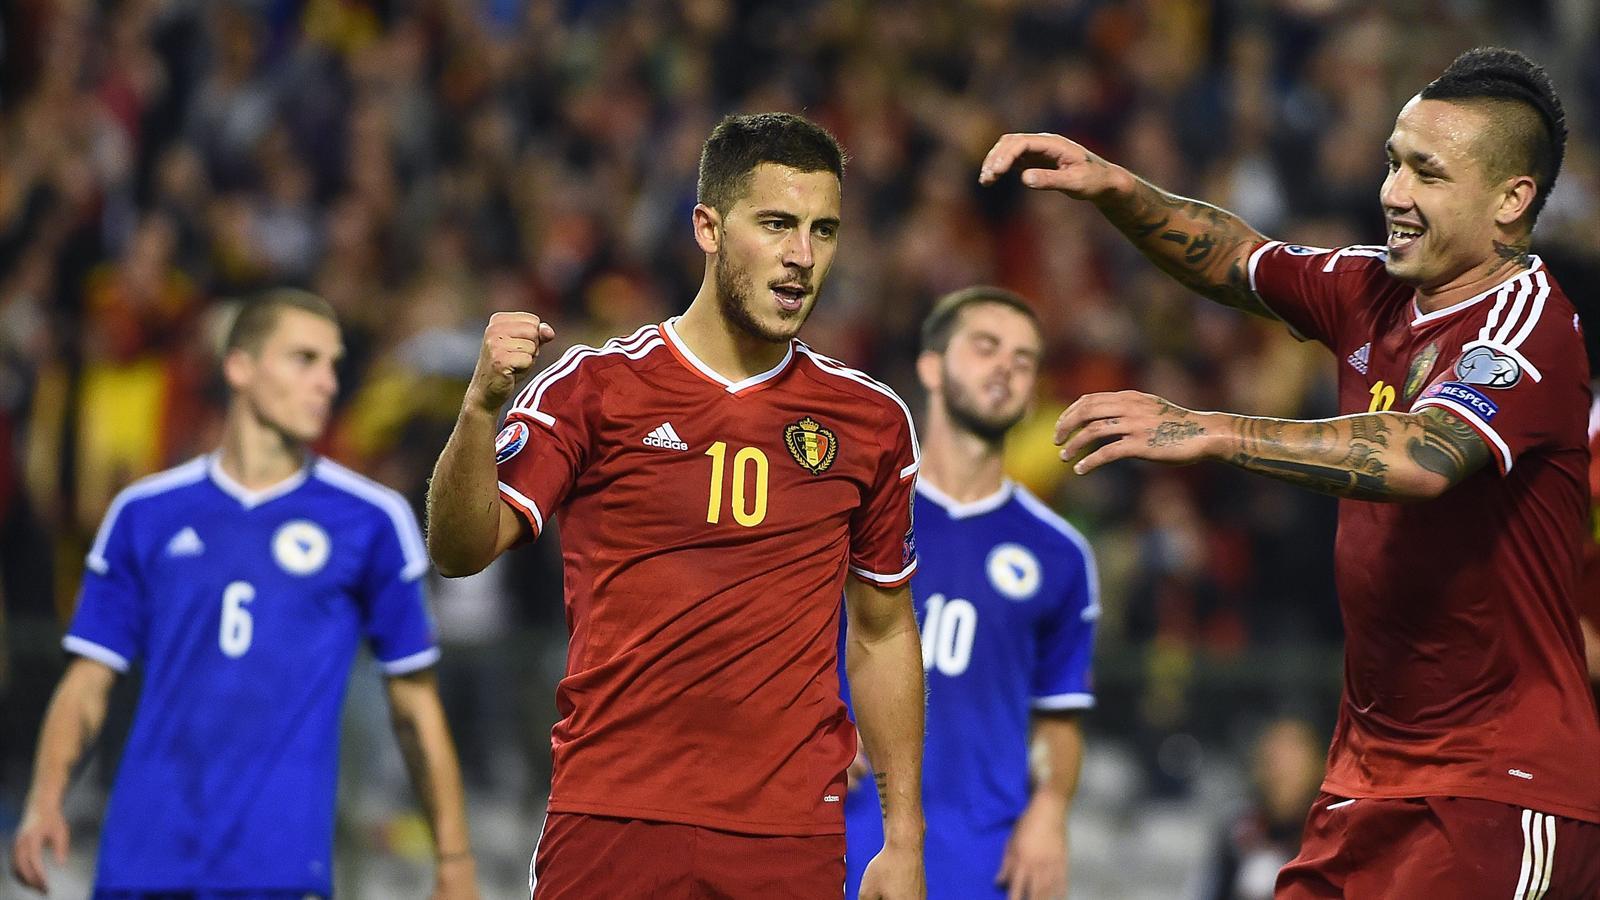 De bruyne, one of belgium's most vital players, joins a squad that features plenty of premier league players, including toby alderweireld,. Twelve Premier League players in Belgium's Euro 2016 squad ...